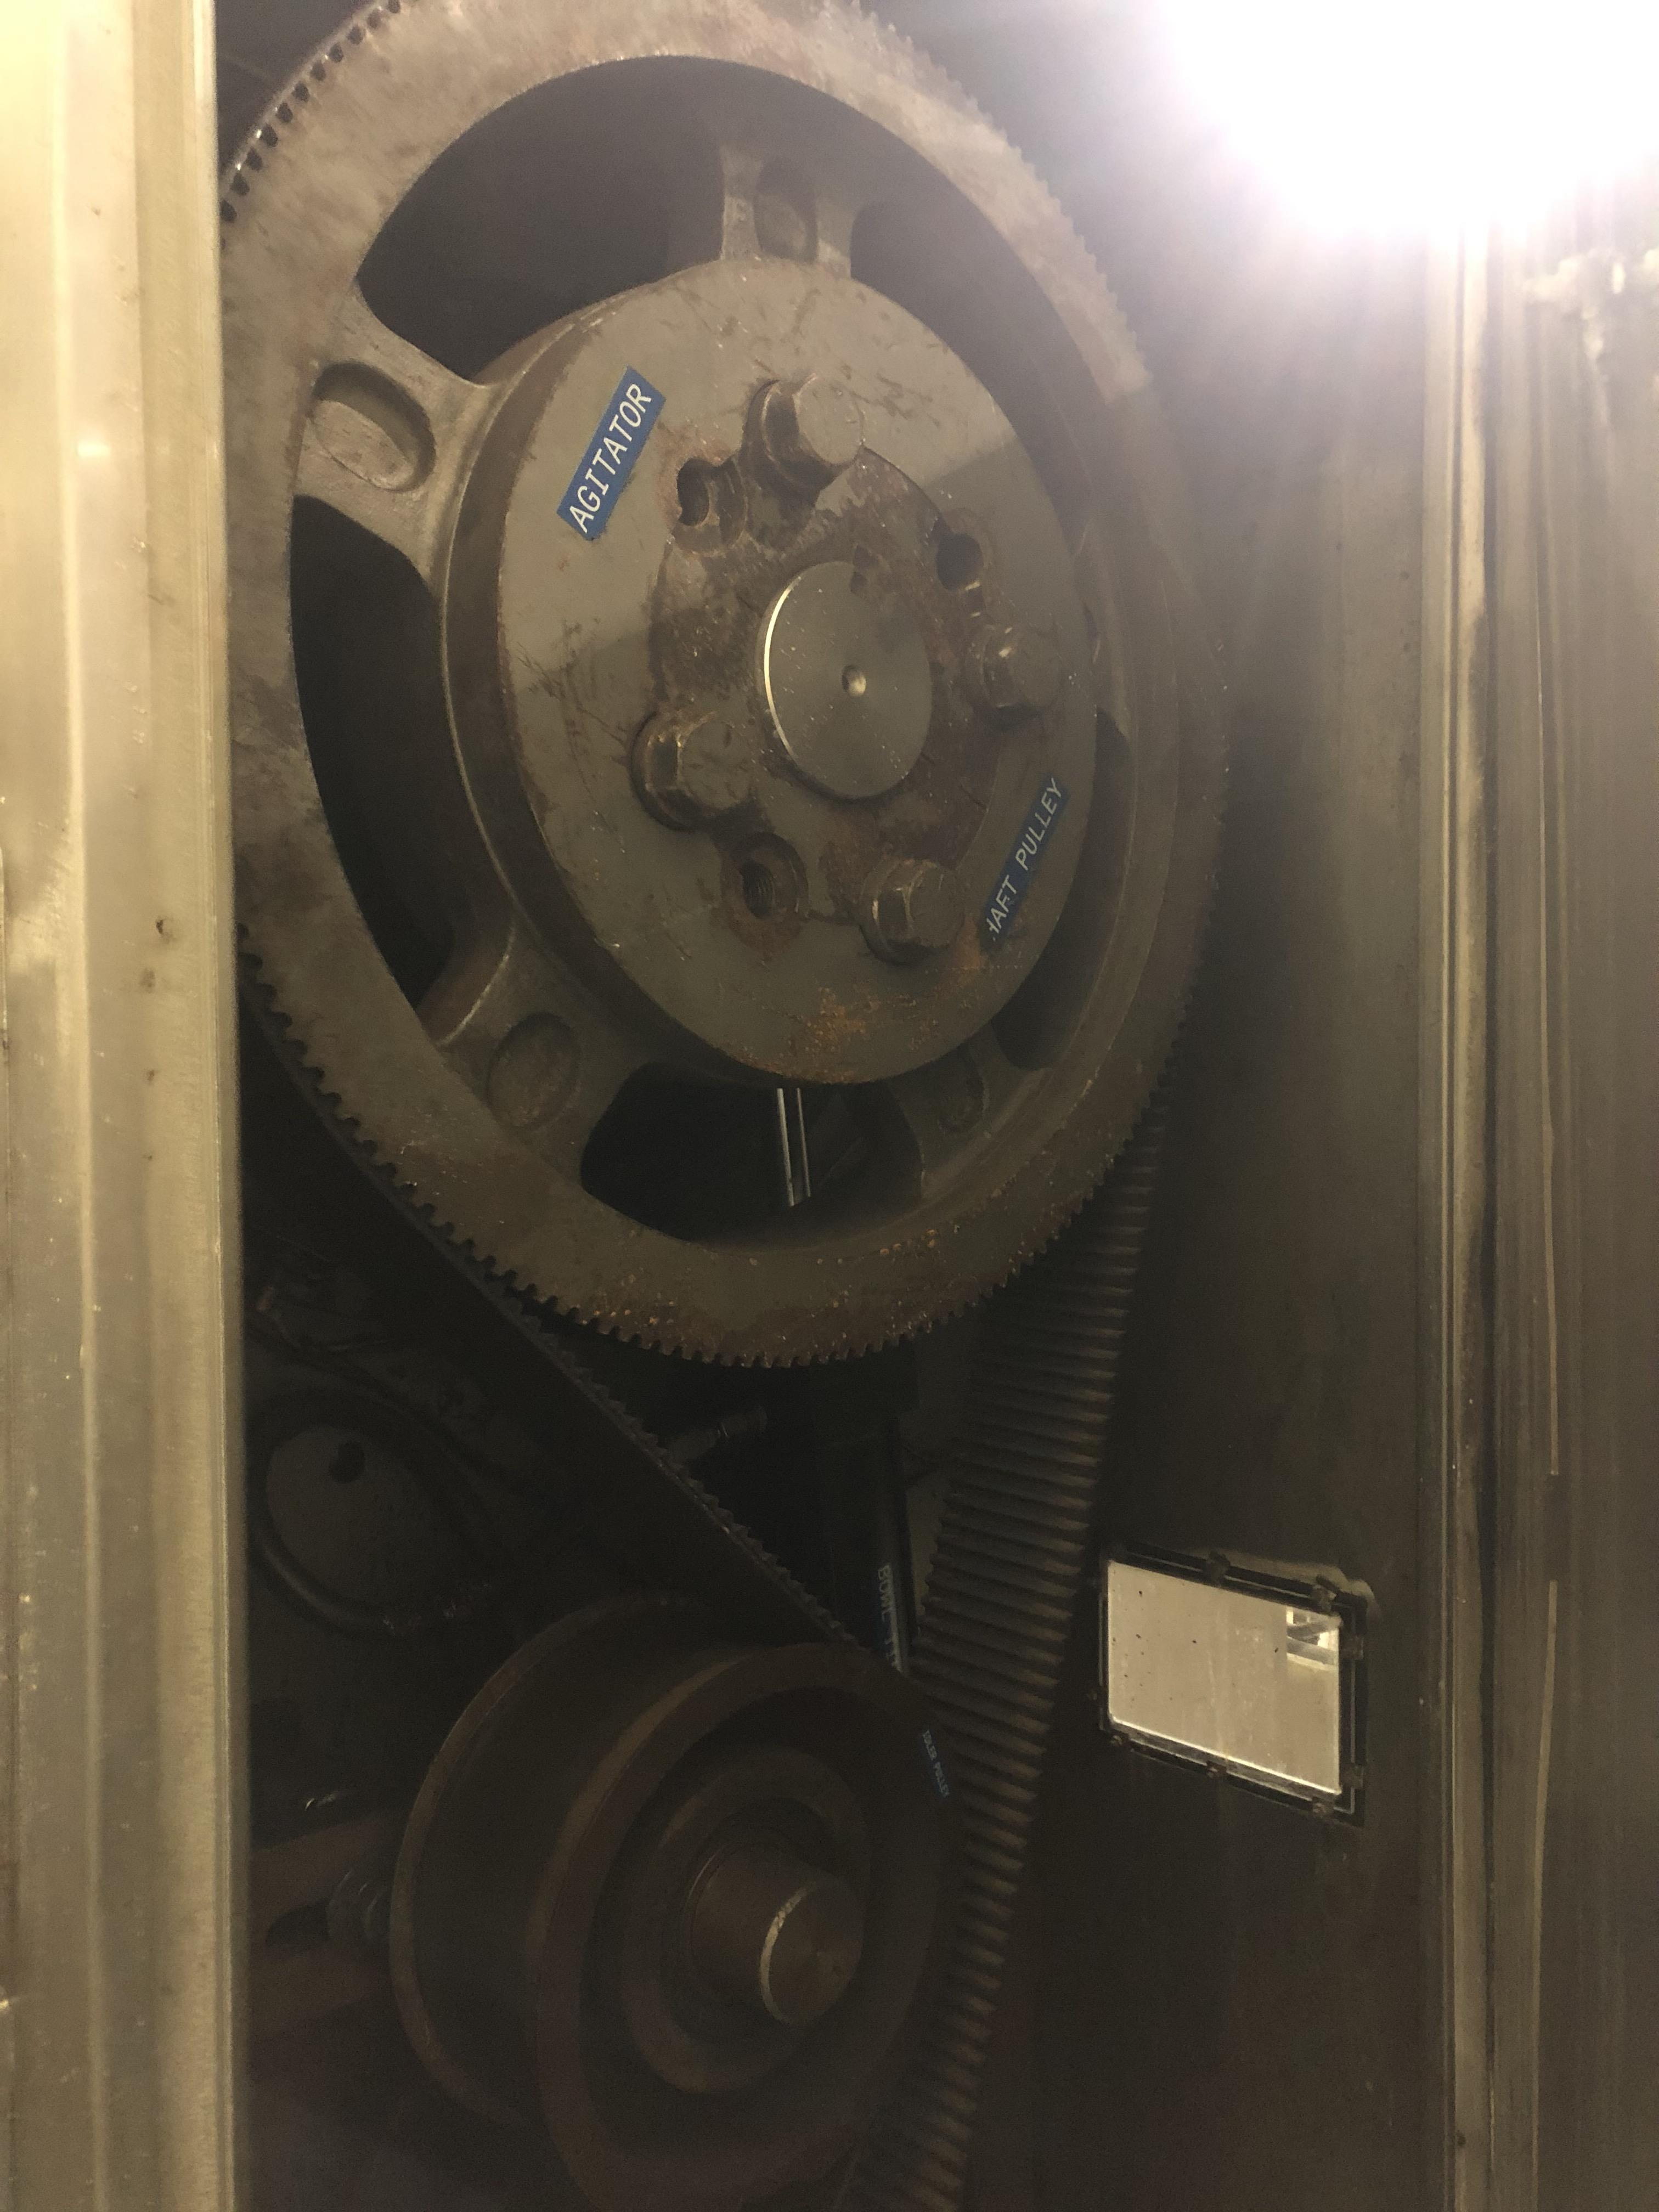 Schaffer 13HS Roller Bar Mixer S/N 0303508 (Rigging Fee - $1350) - Image 4 of 5